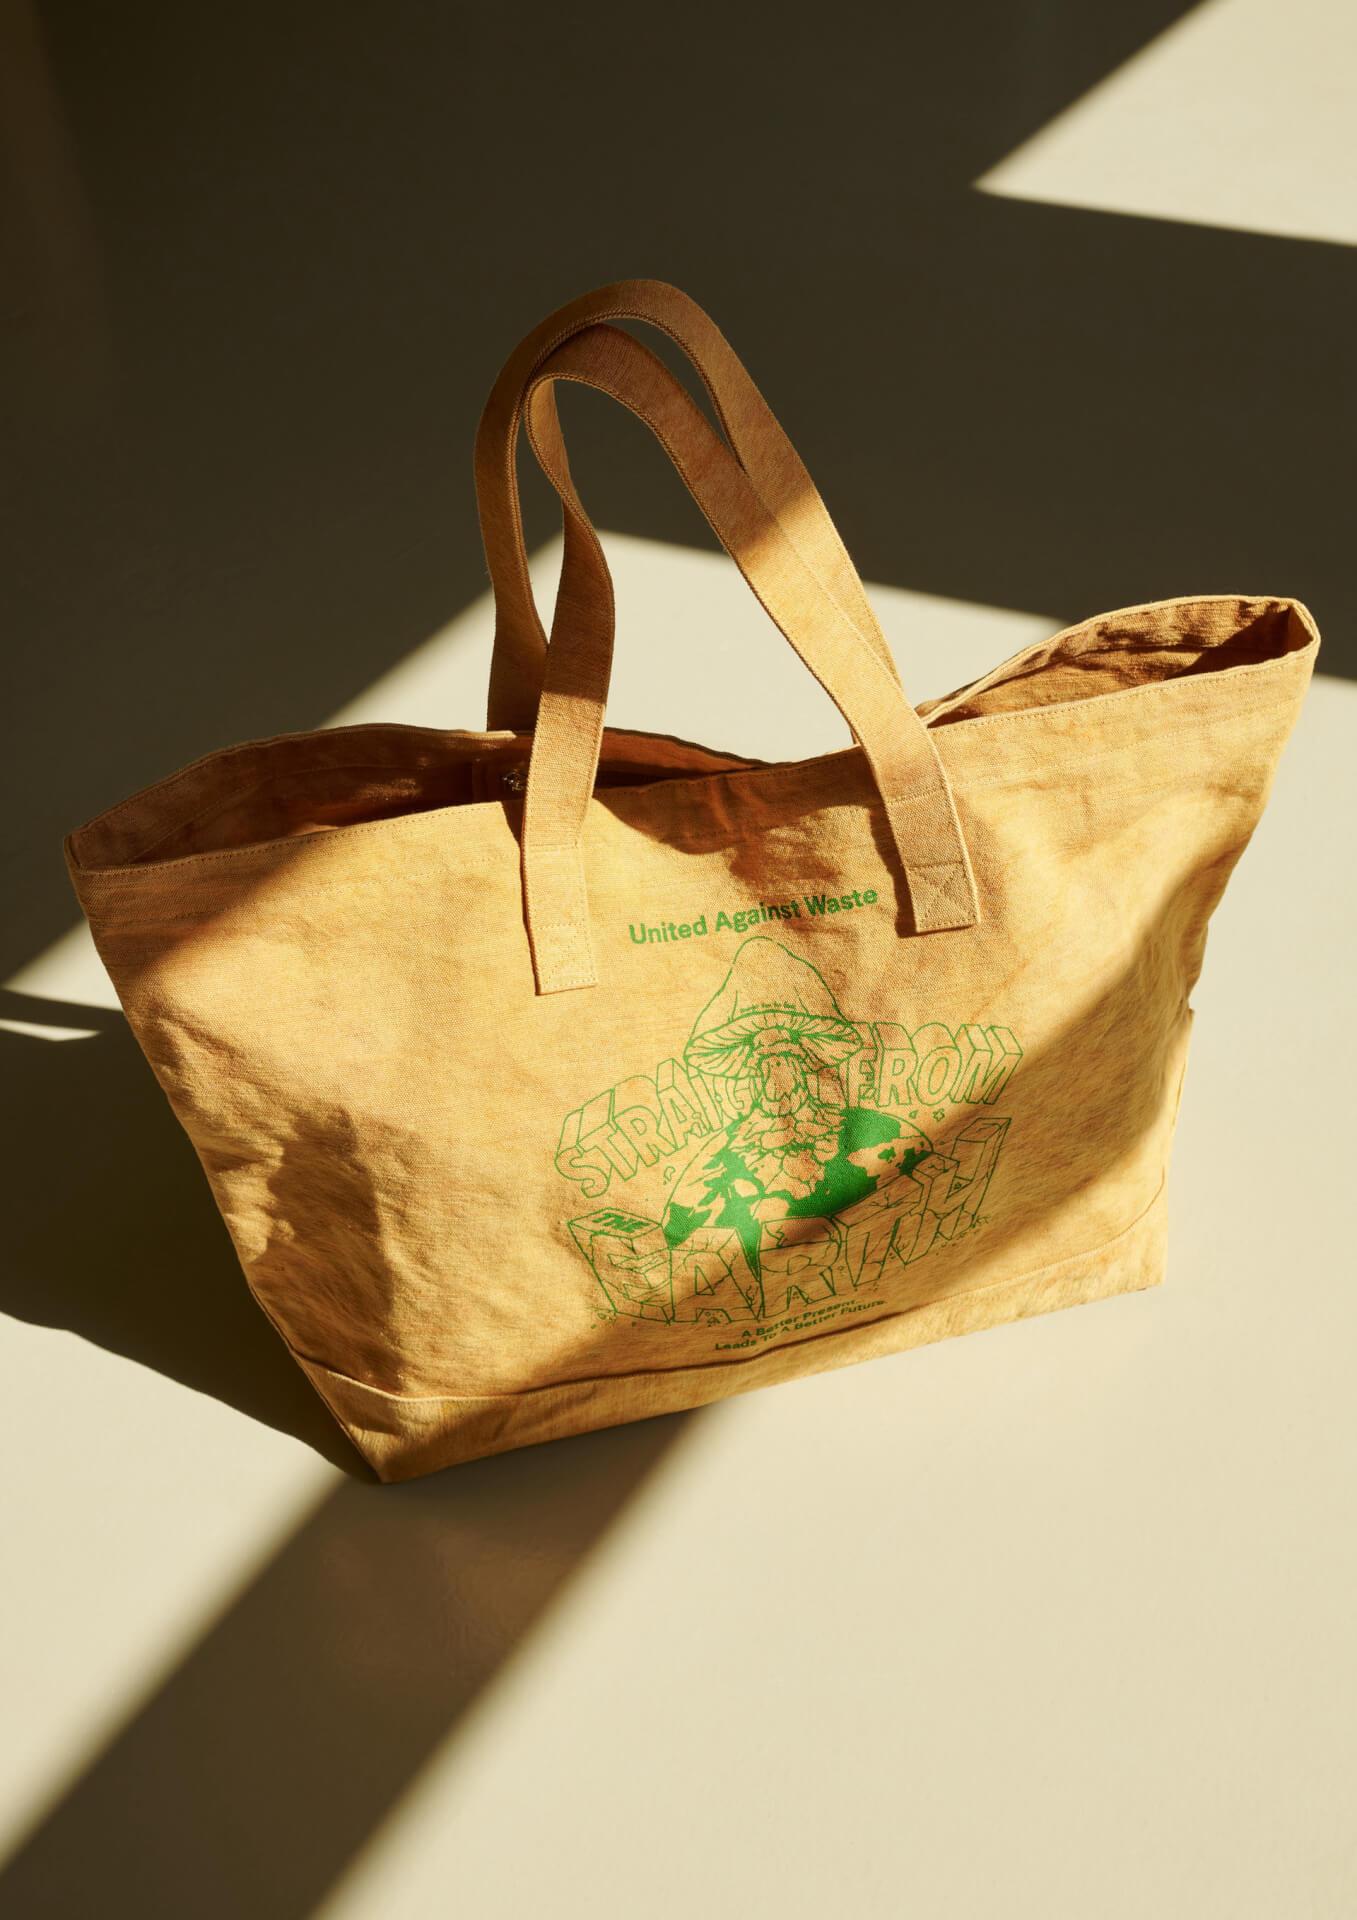 H&Mが俳優のジョン・ボイエガとタッグを組んだメンズウェアコレクションを発表!リサイクル素材、オーガニック素材を使用したアイテムが登場 life211006_handm_john_boyega_014